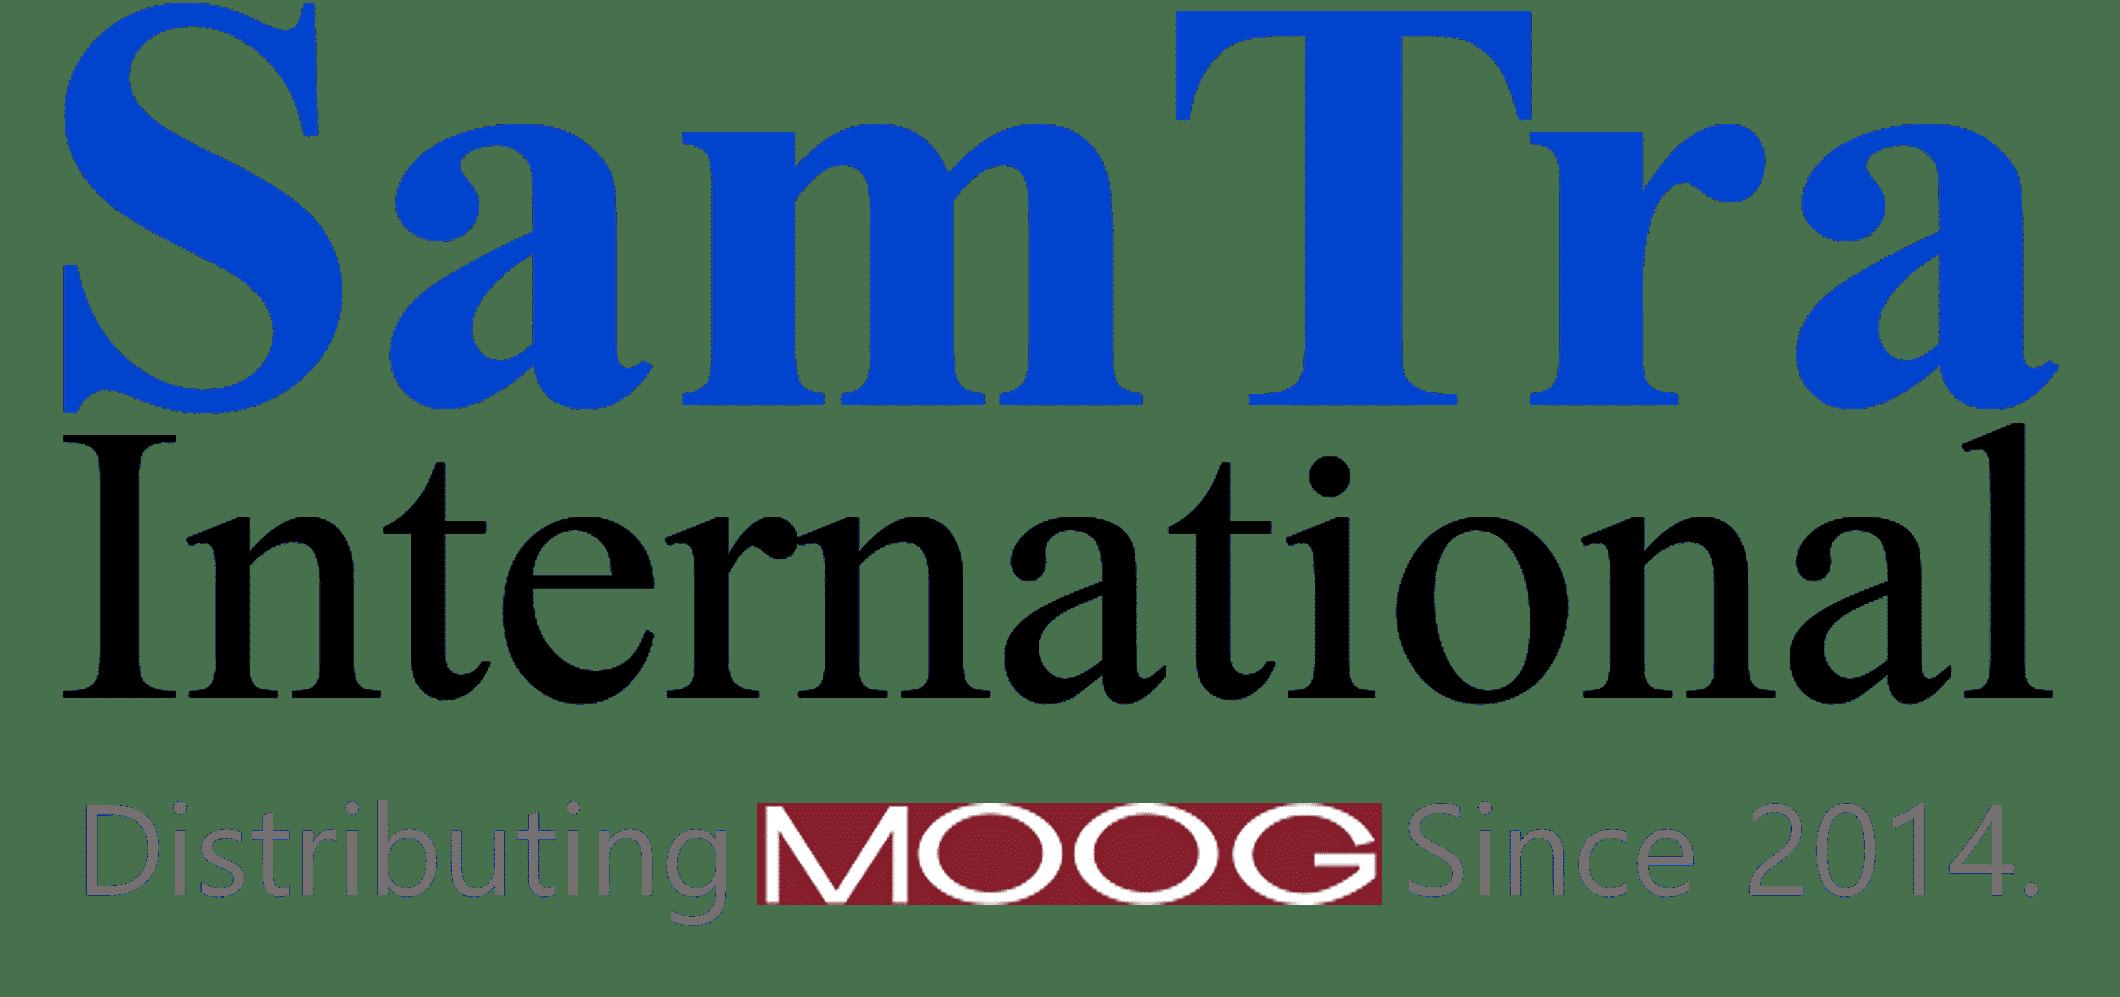 SamTra MOOG Partnership